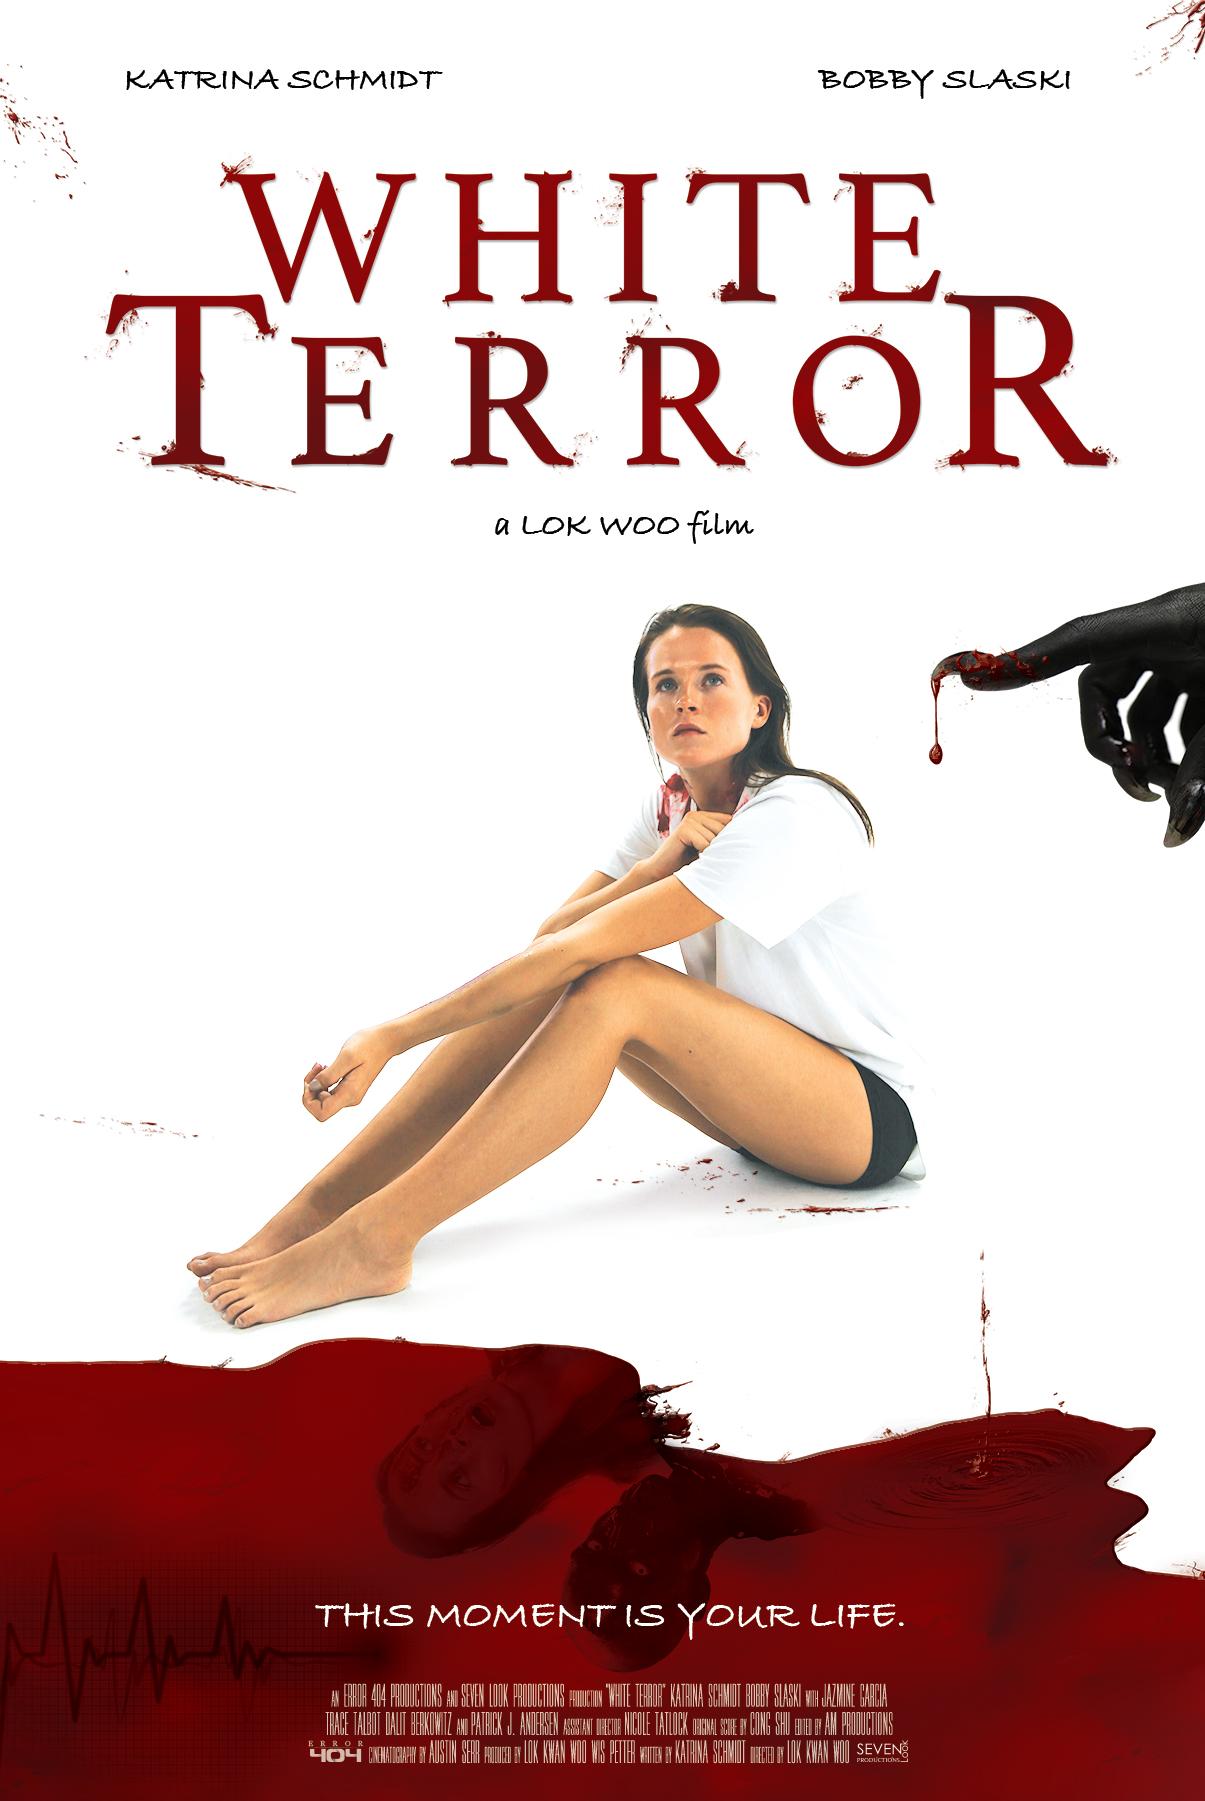 Download White Terror (2020) WebRip 720p Full Movie [In English] With Hindi Subtitles FREE on 1XCinema.com & KatMovieHD.io